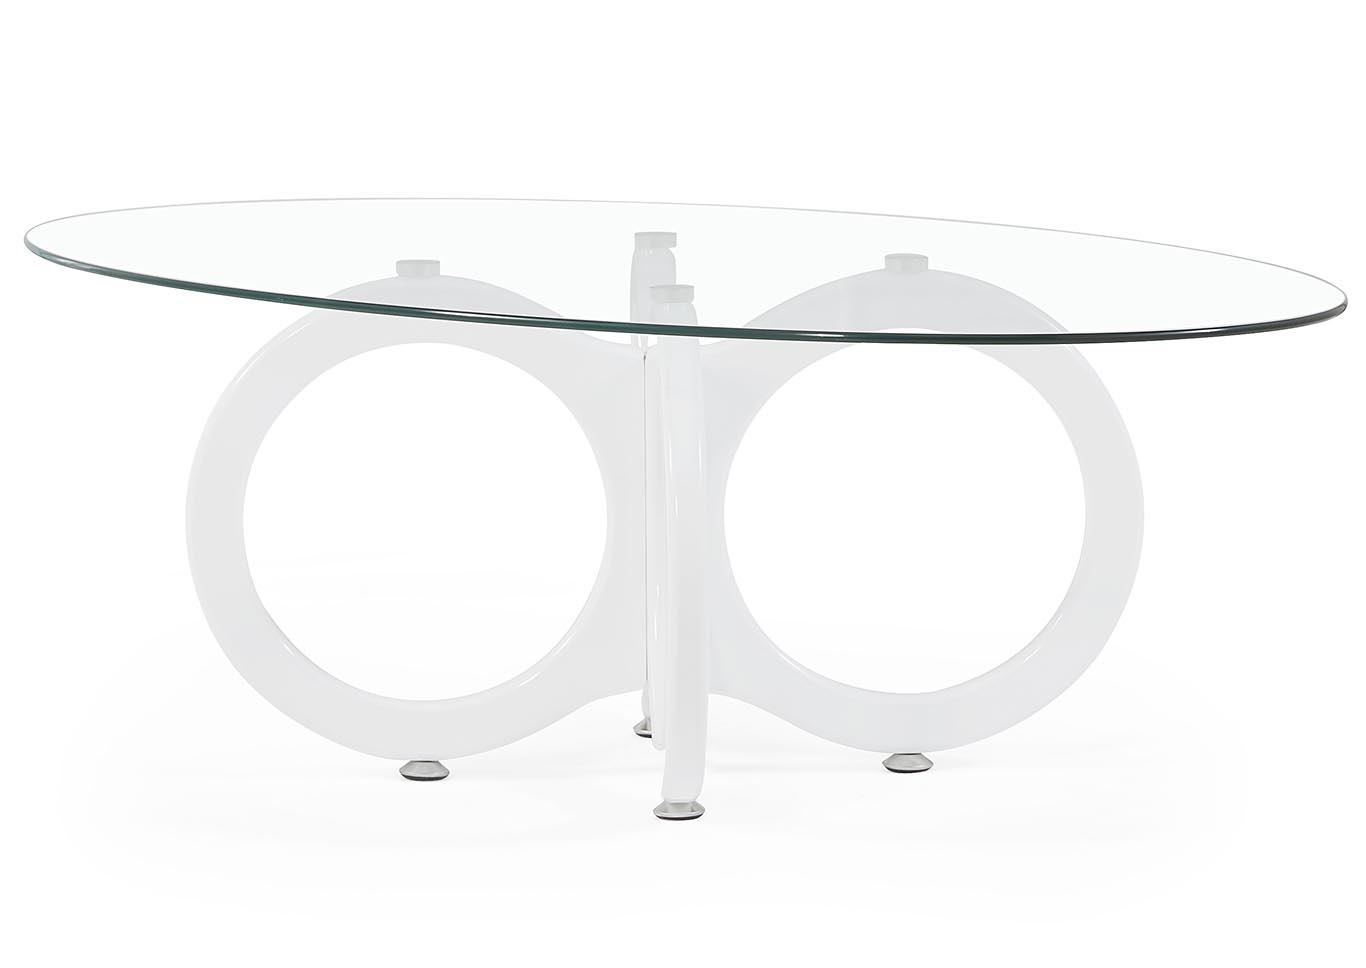 Strange Deals More Furniture Philadelphia Pa Clear High Gloss Download Free Architecture Designs Crovemadebymaigaardcom